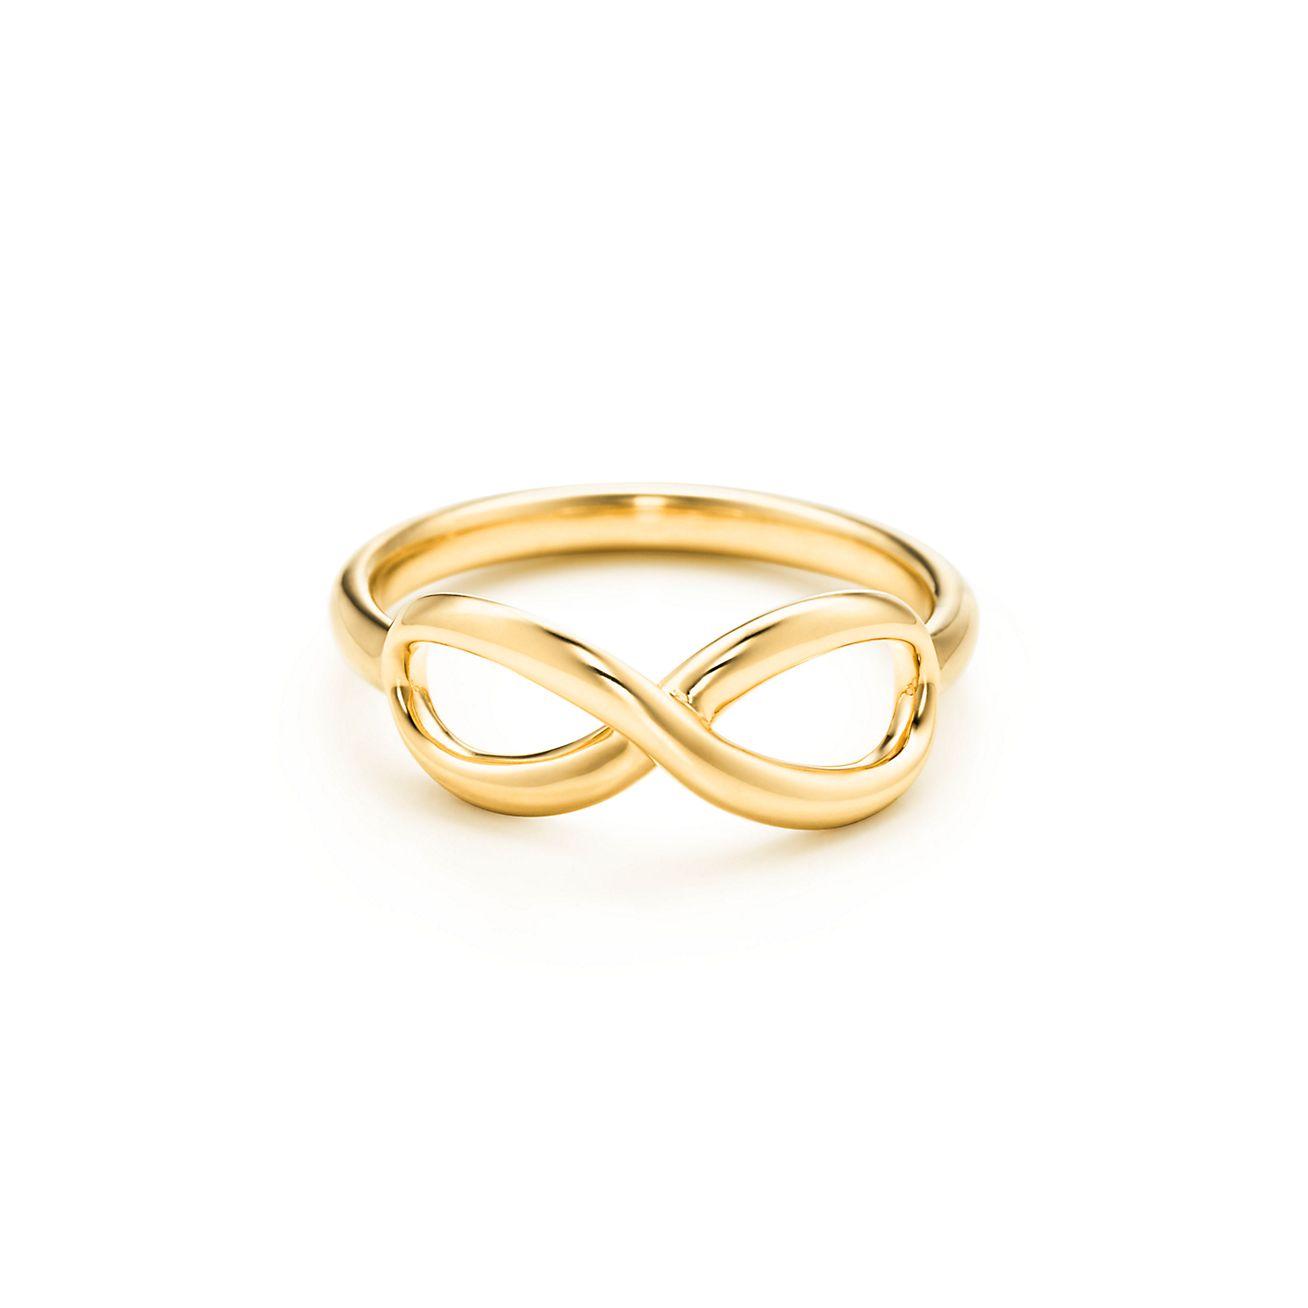 Tiffany Infinity Ring In 18k Gold Tiffany Amp Co